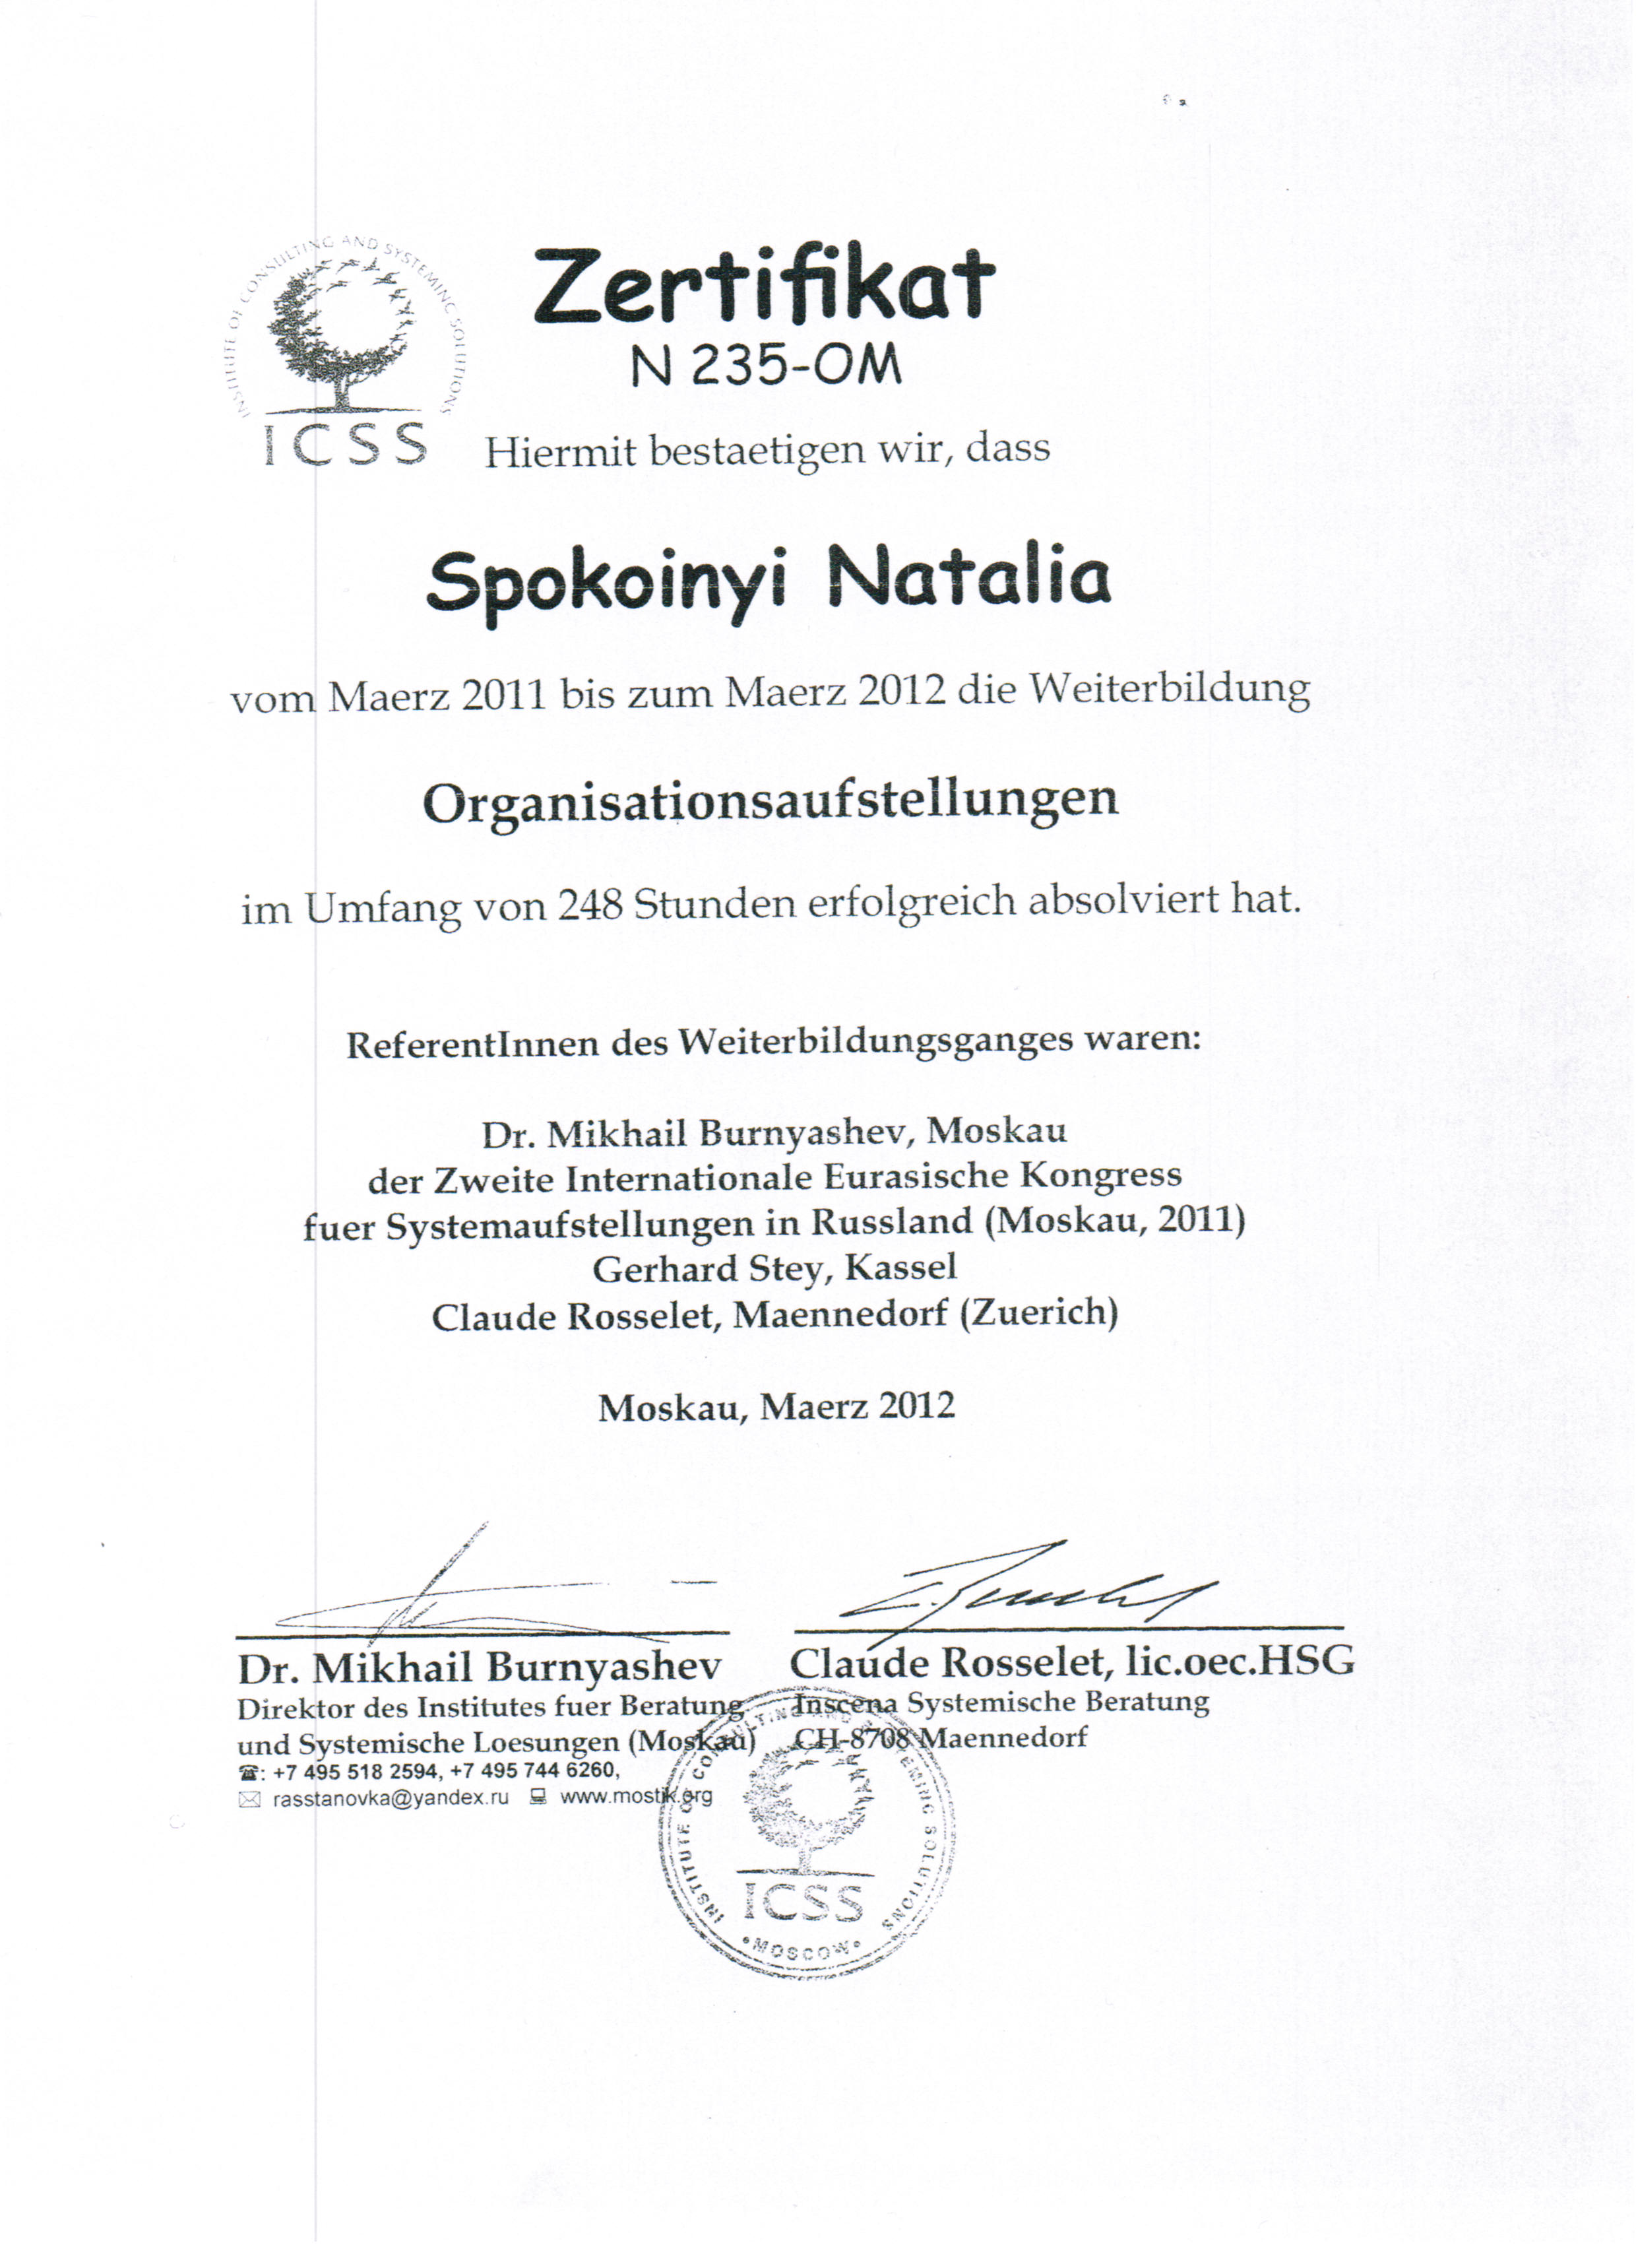 Natalia Spokoinyi